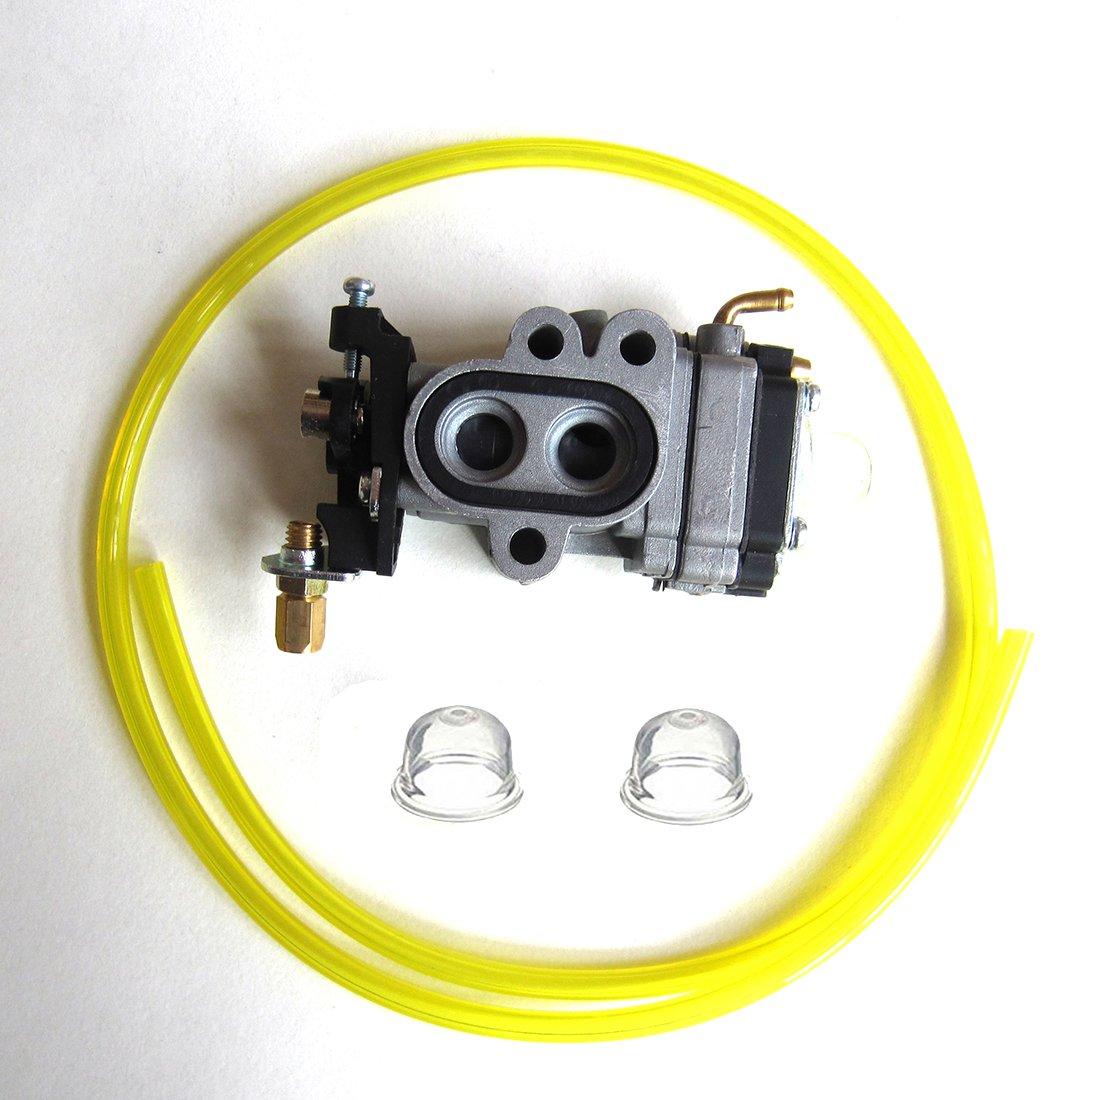 Carburetor carb Replace Walbro Carburetor WYA-121-1, Red Max BCZ2650S, BCZ2660TS USA SHIPPING